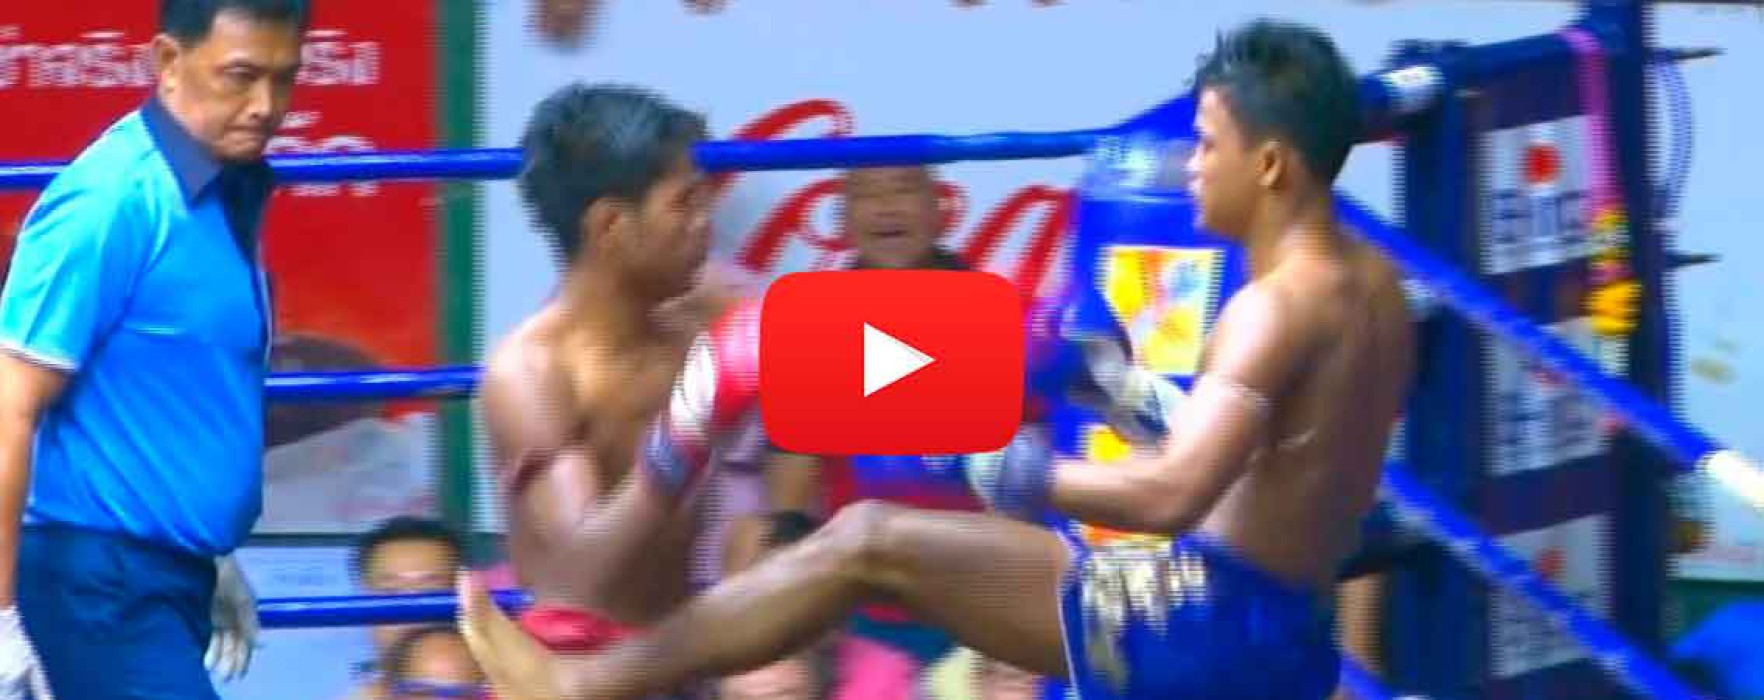 Analyzing Muay Thai Fighter of the Year - Muangthai PK Saenchai